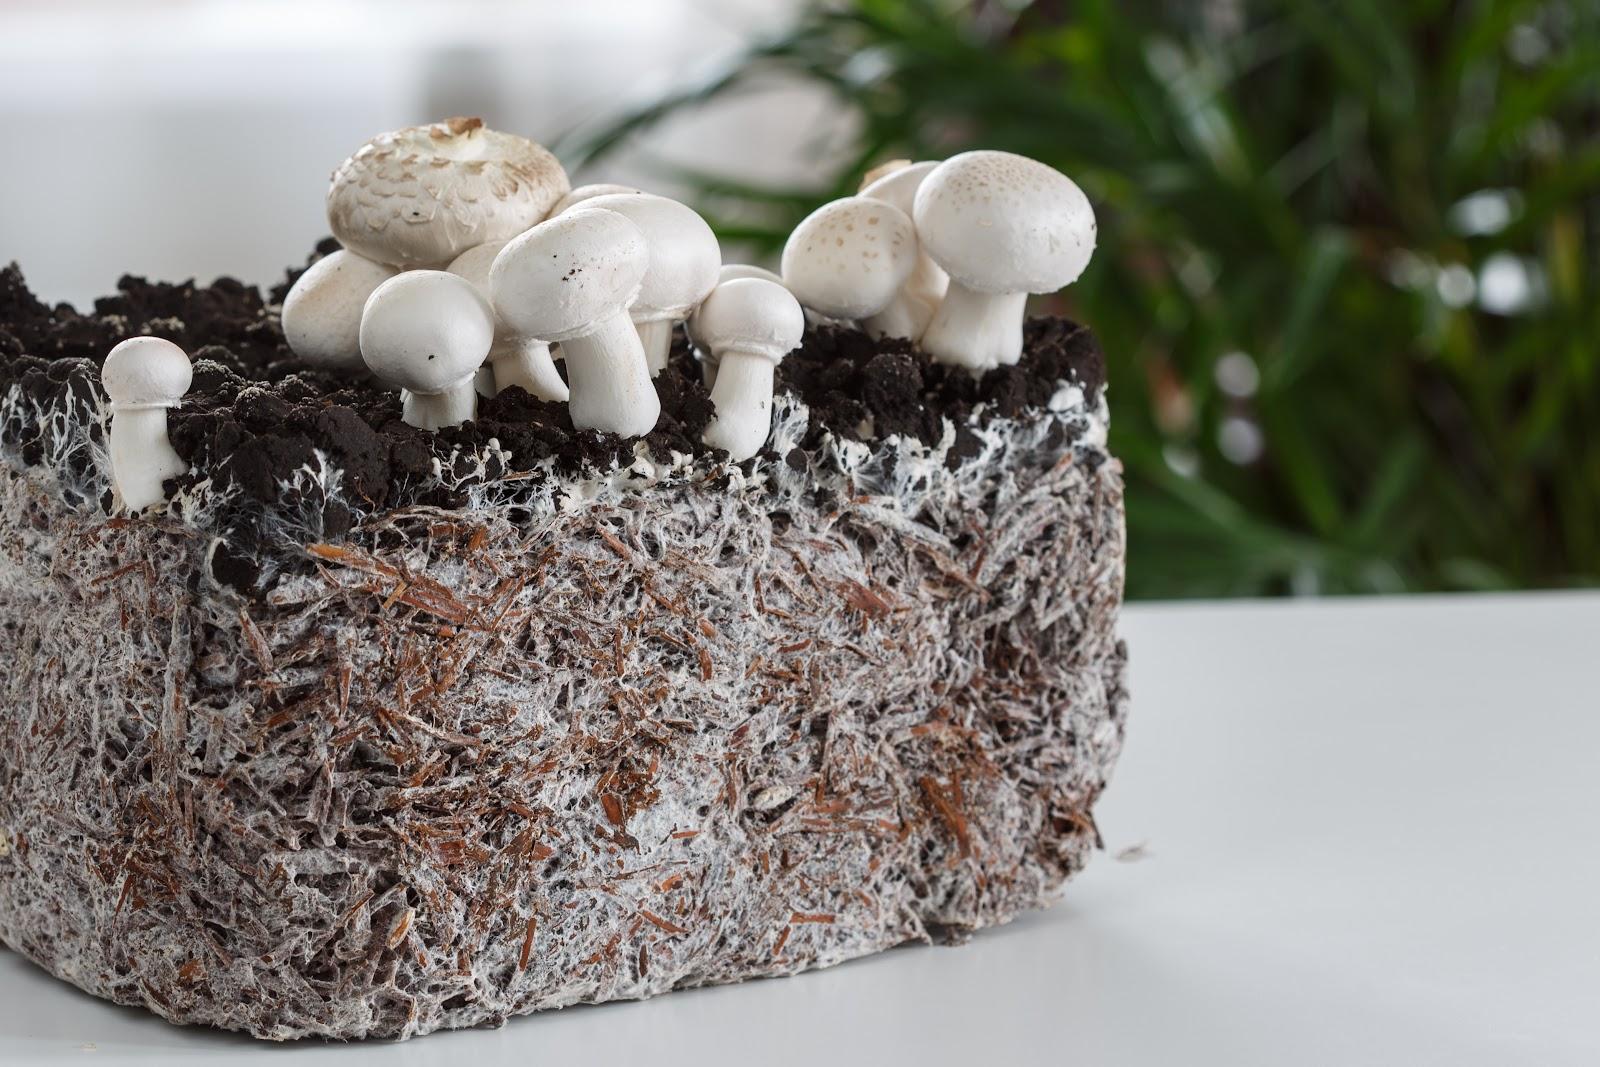 how to grow mushrooms: grown mushrooms